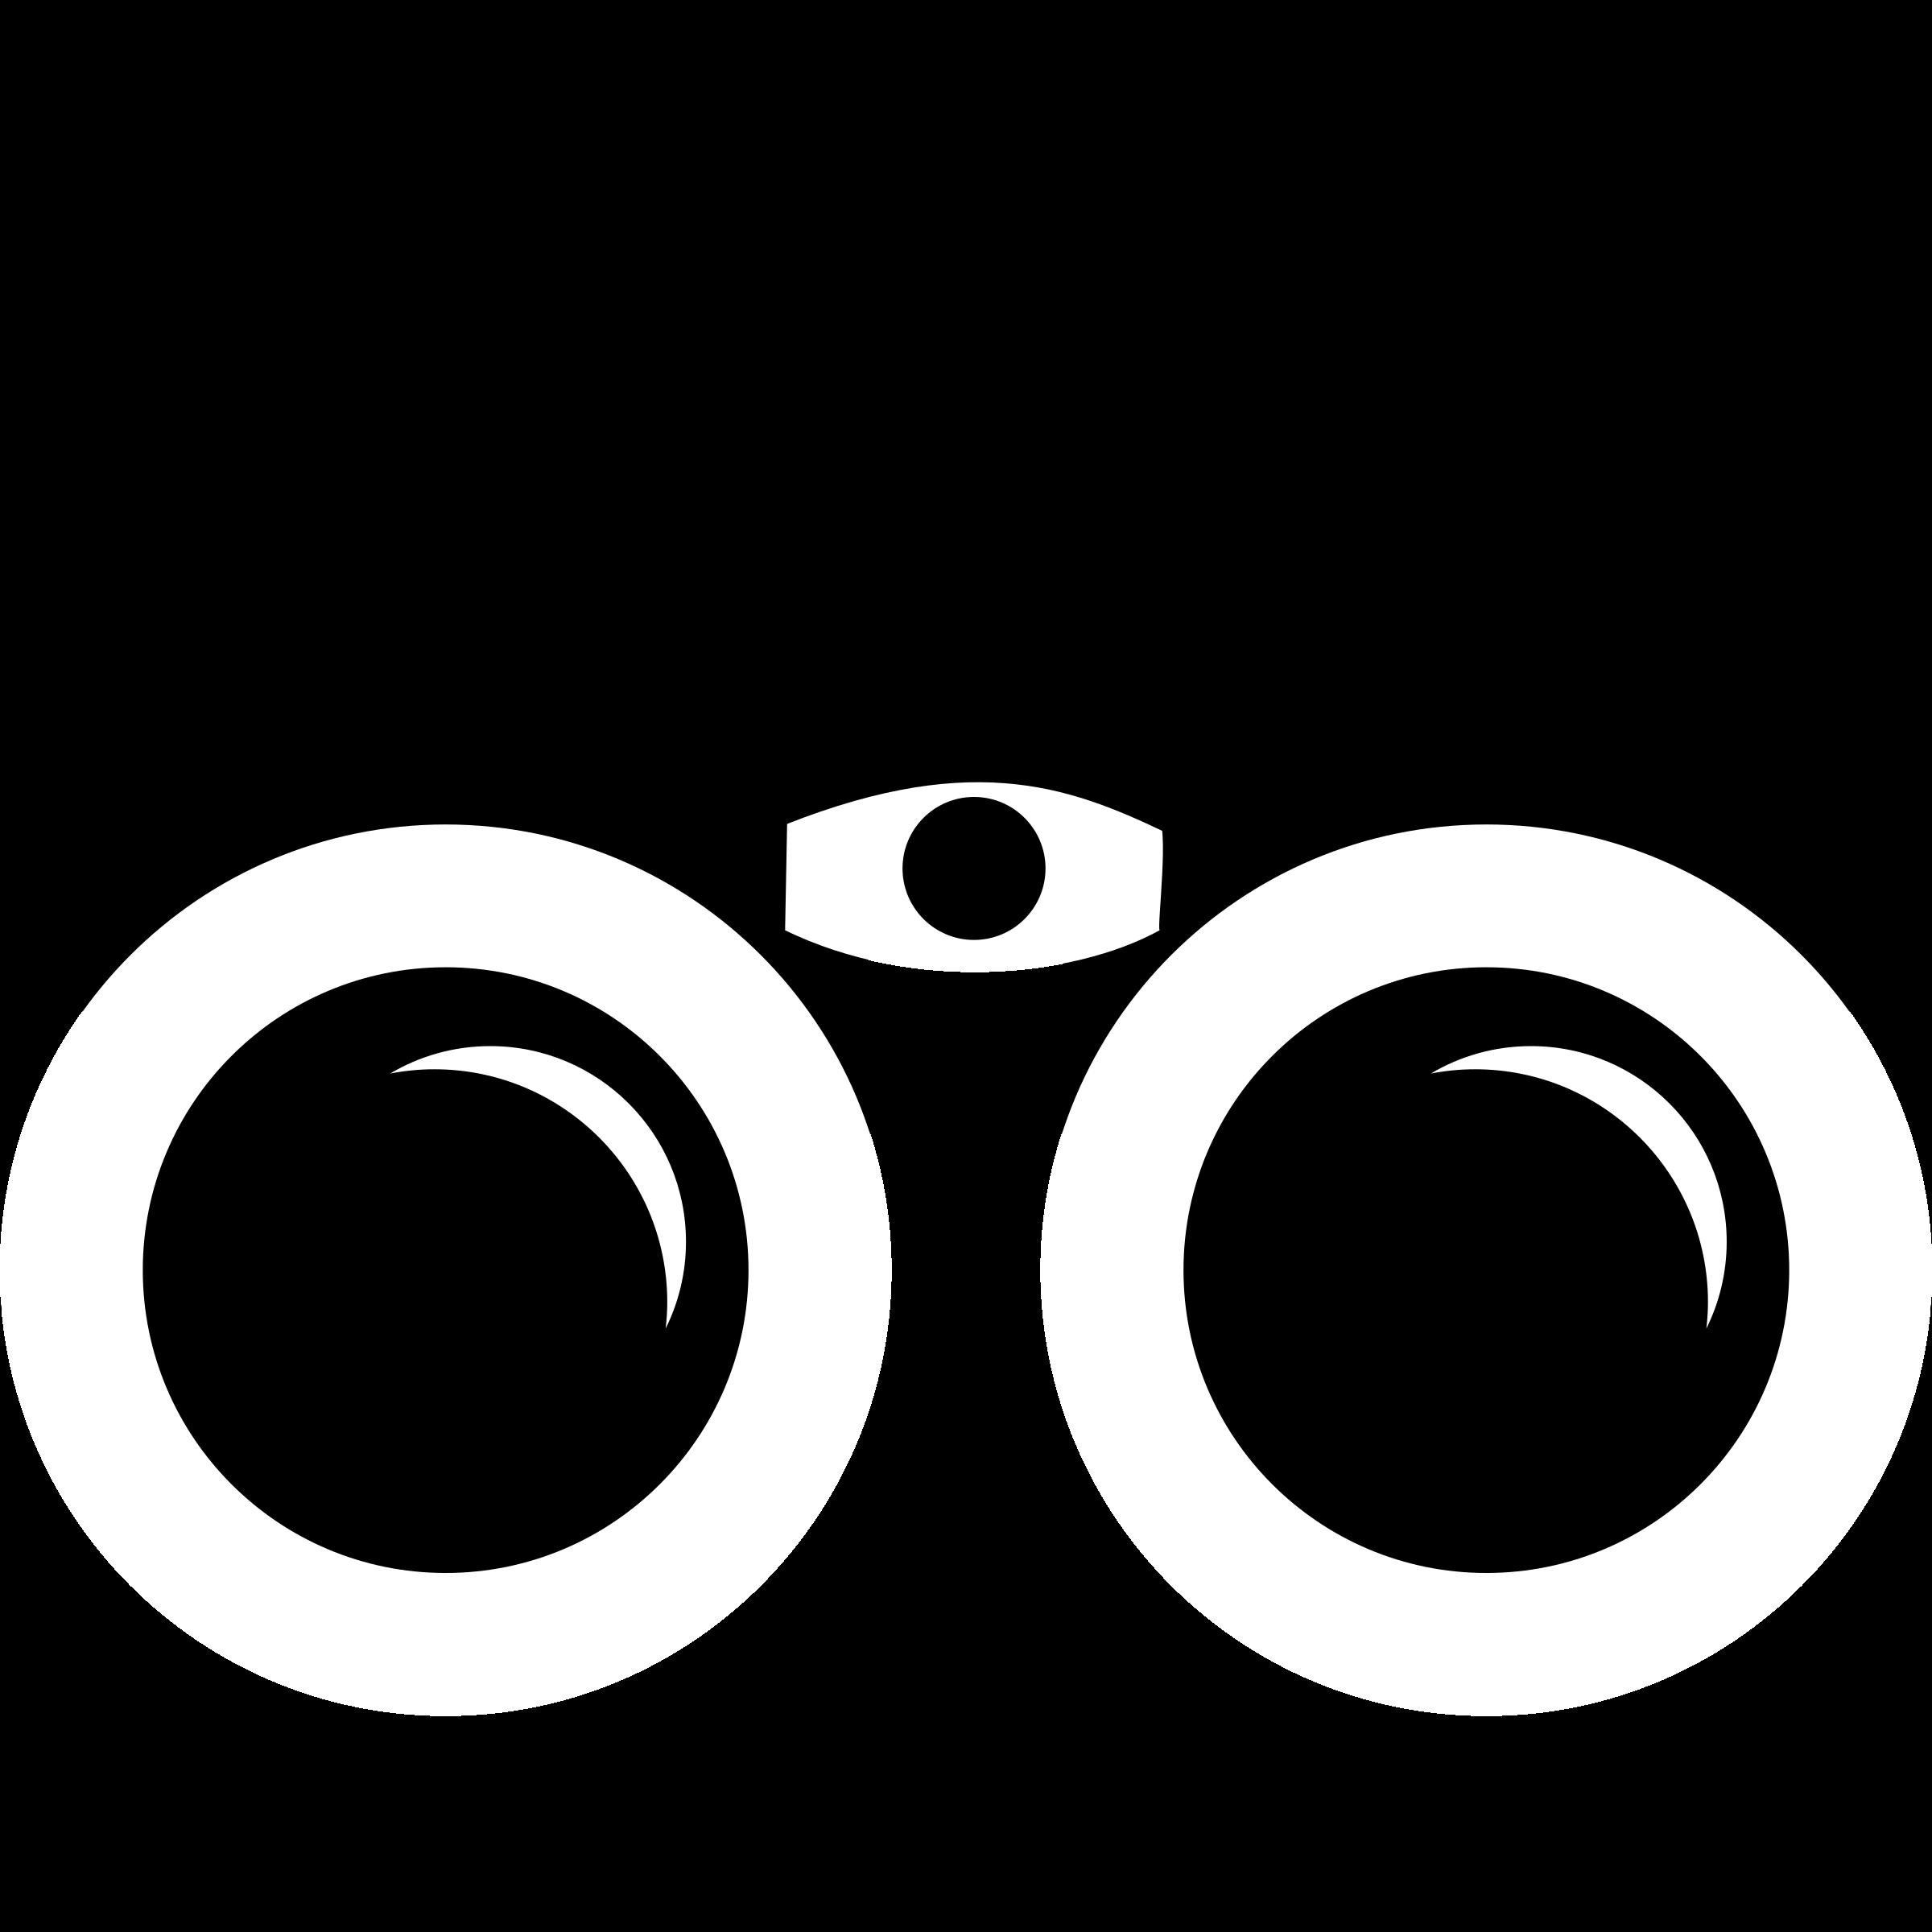 jpg library download Binocular clipart. Big image png.